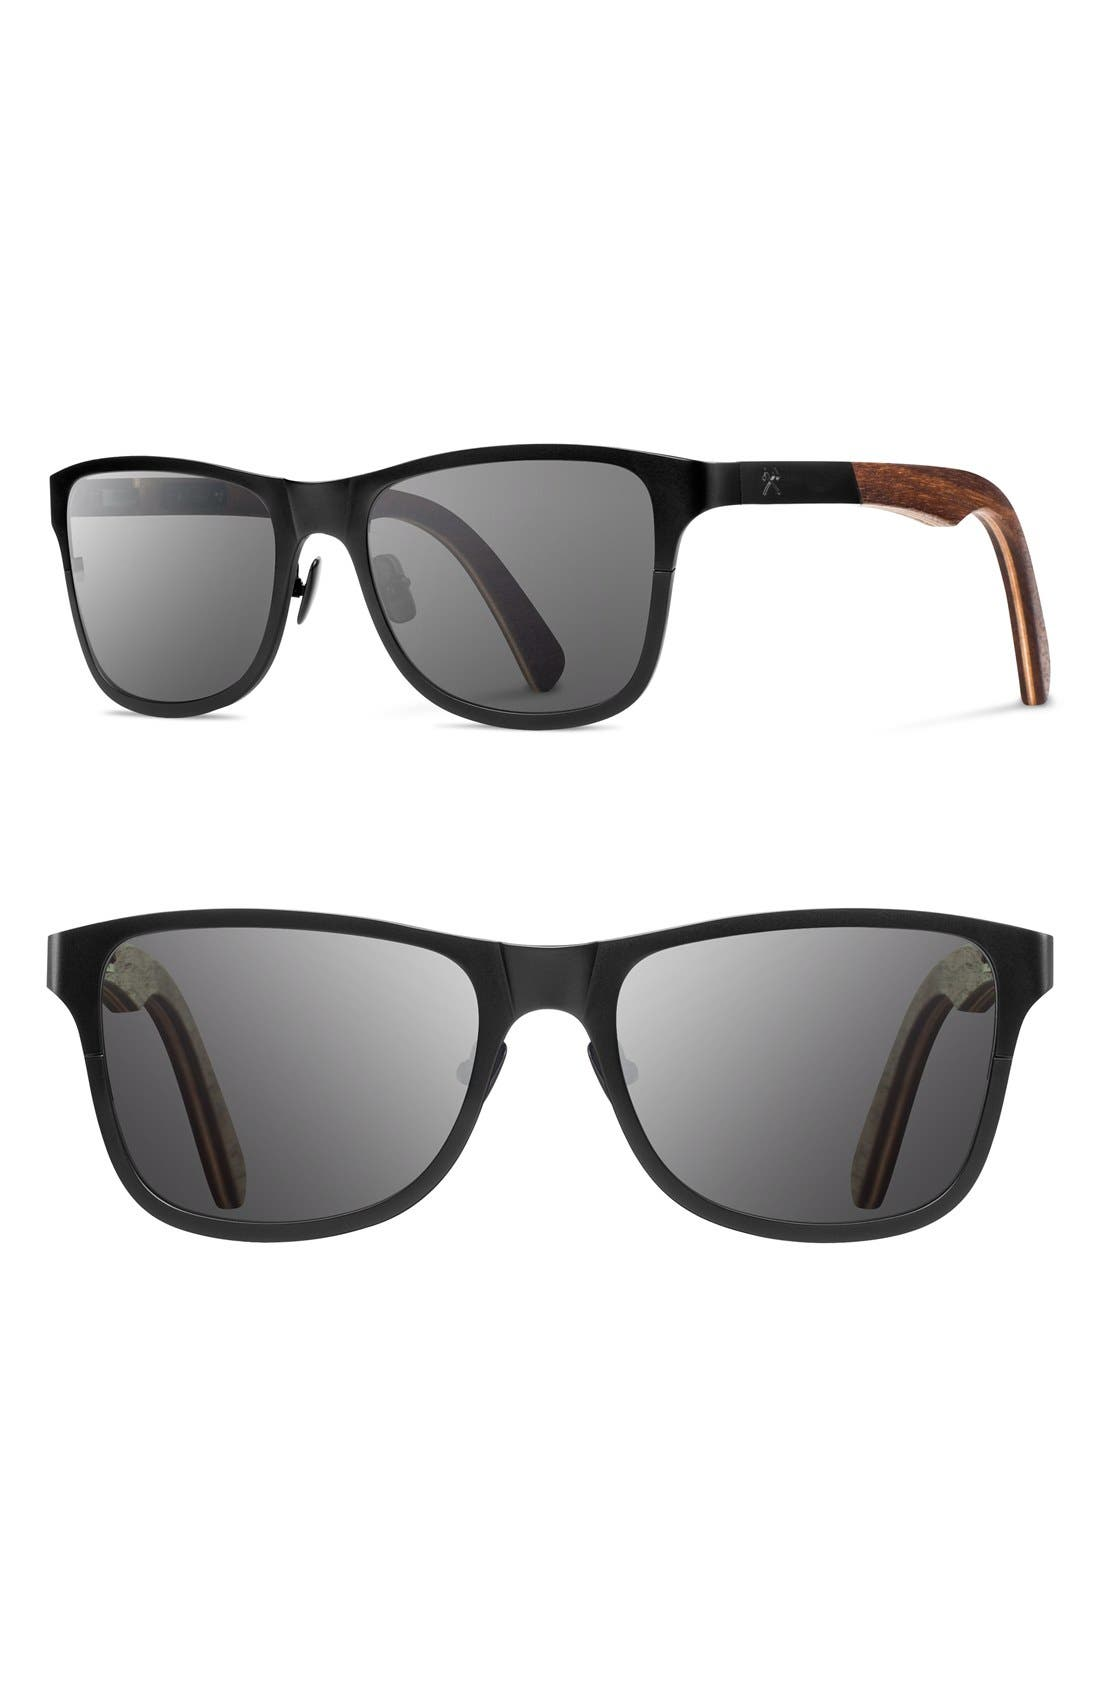 'Canby' 54mm Titanium & Wood Sunglasses,                         Main,                         color, BLACK/ WALNUT